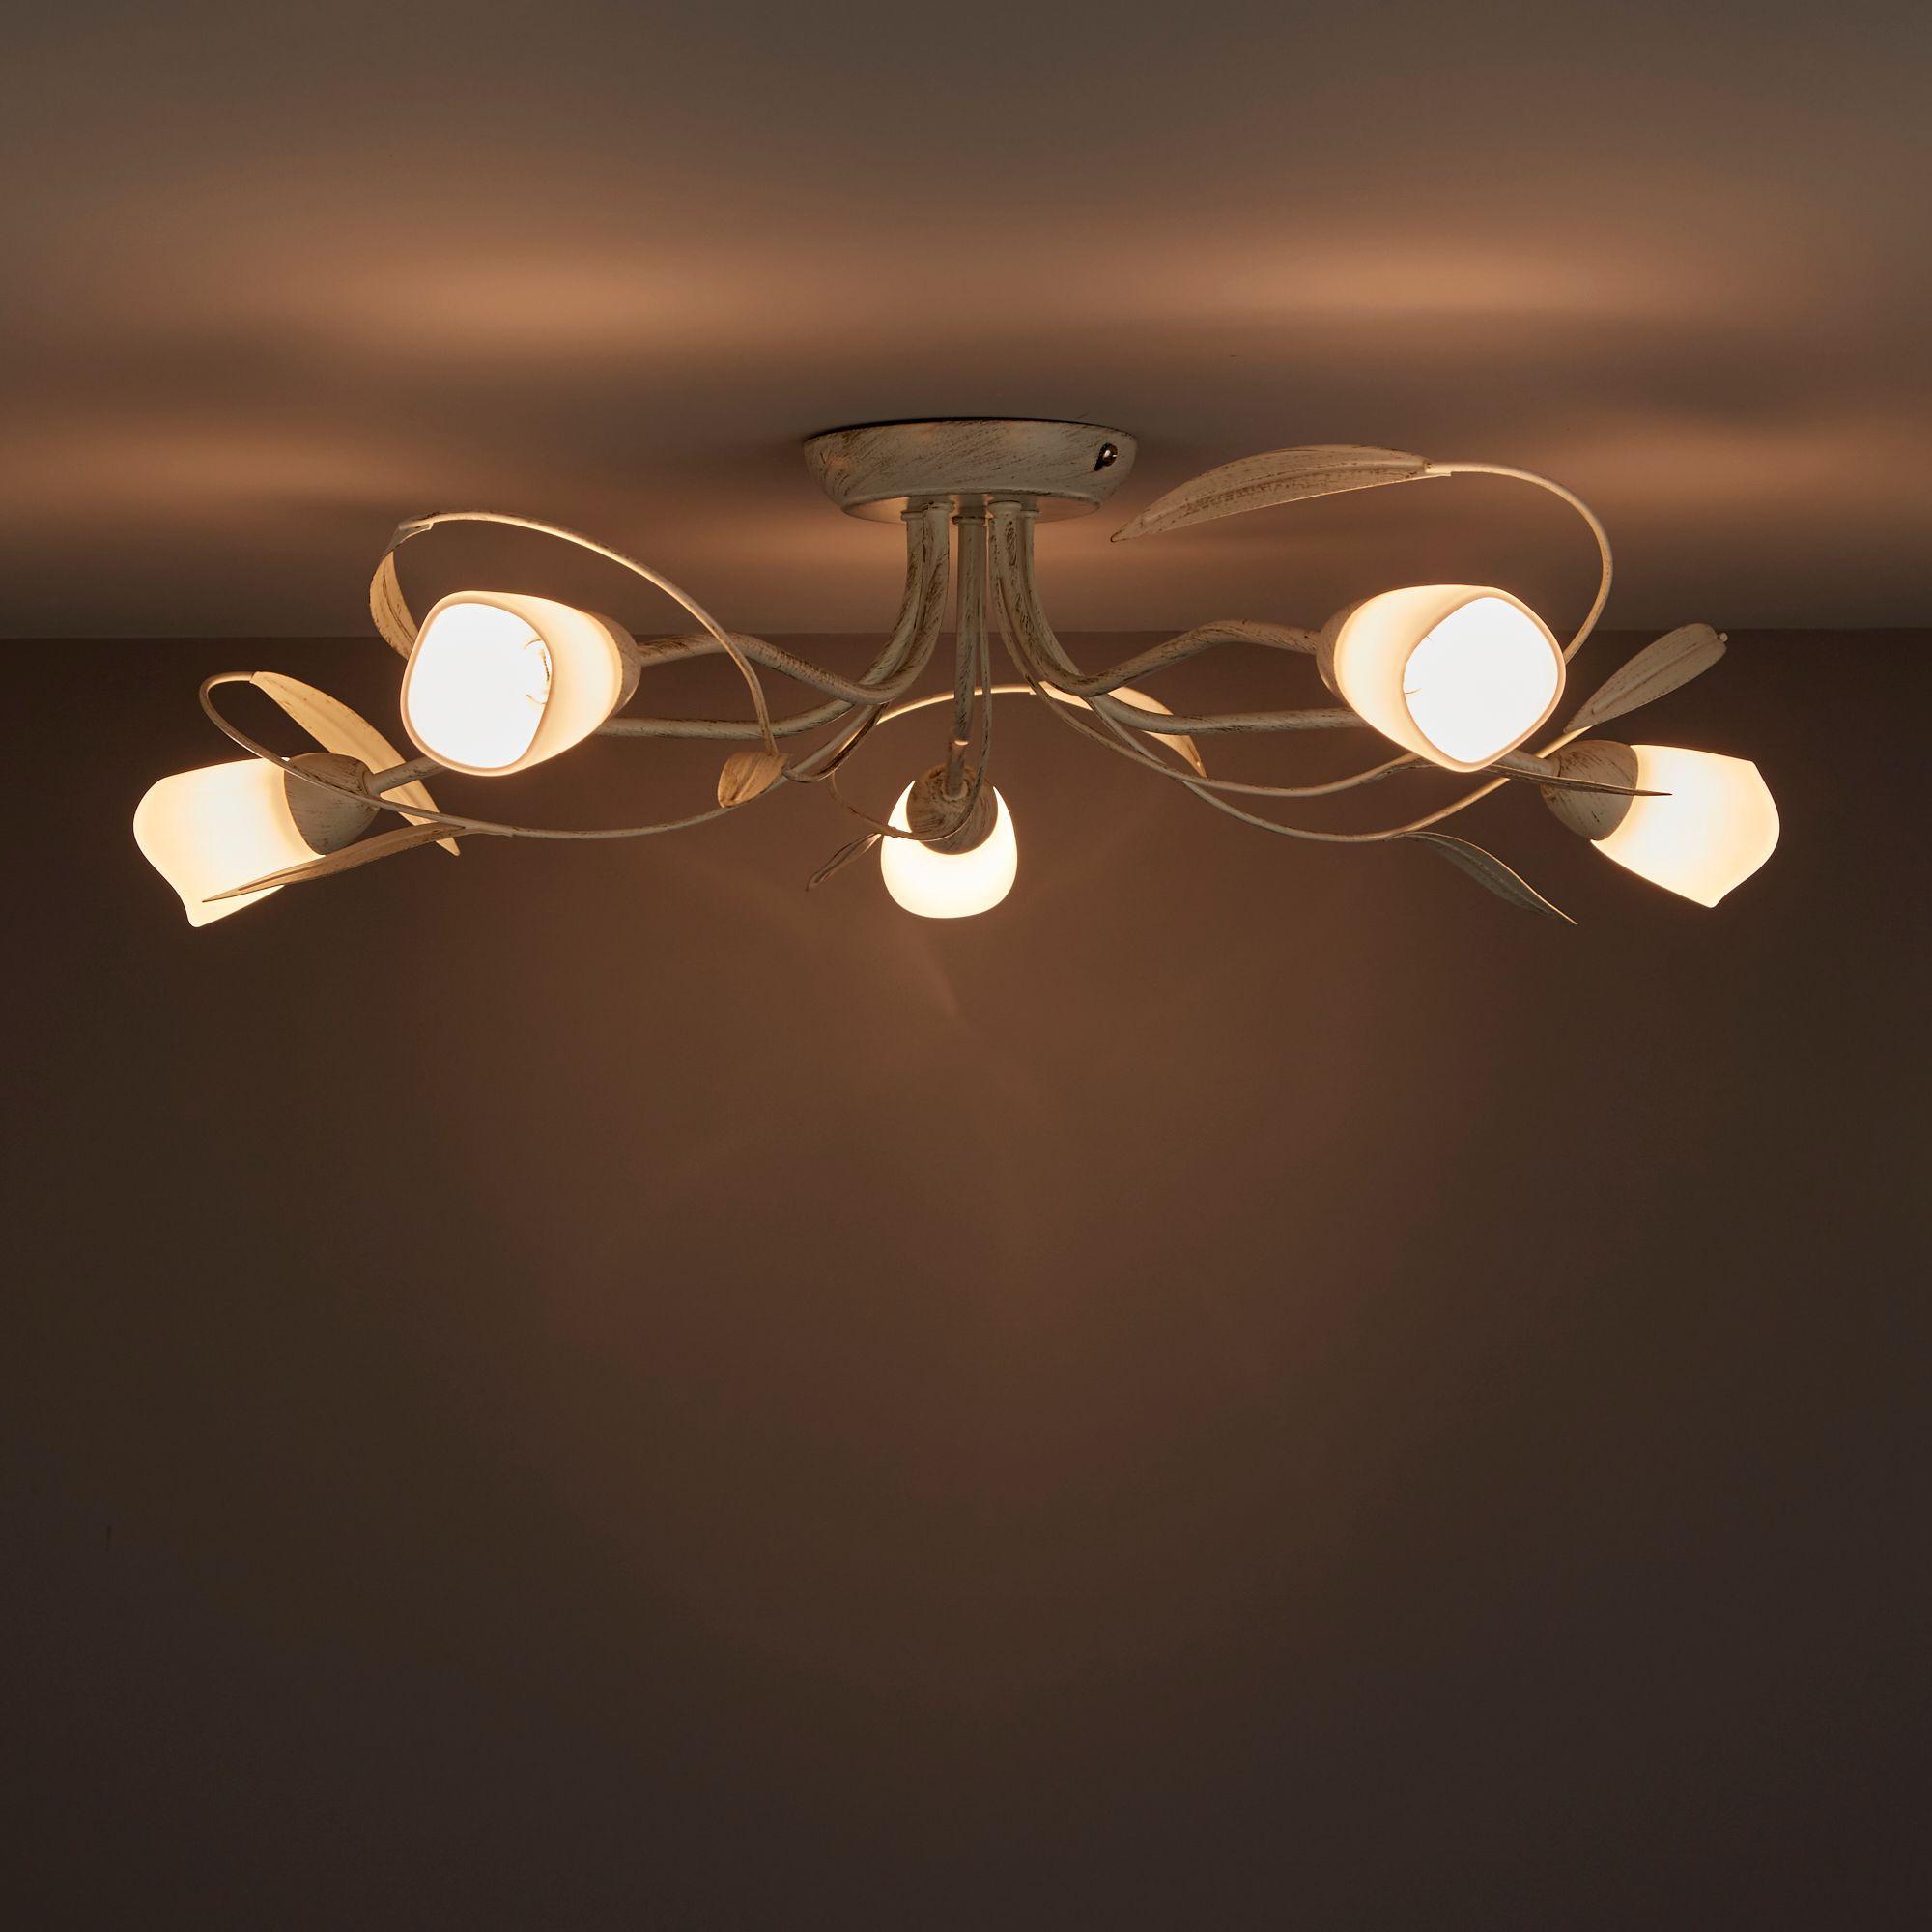 Honos Cream & gold Brushed 5 Lamp Ceiling